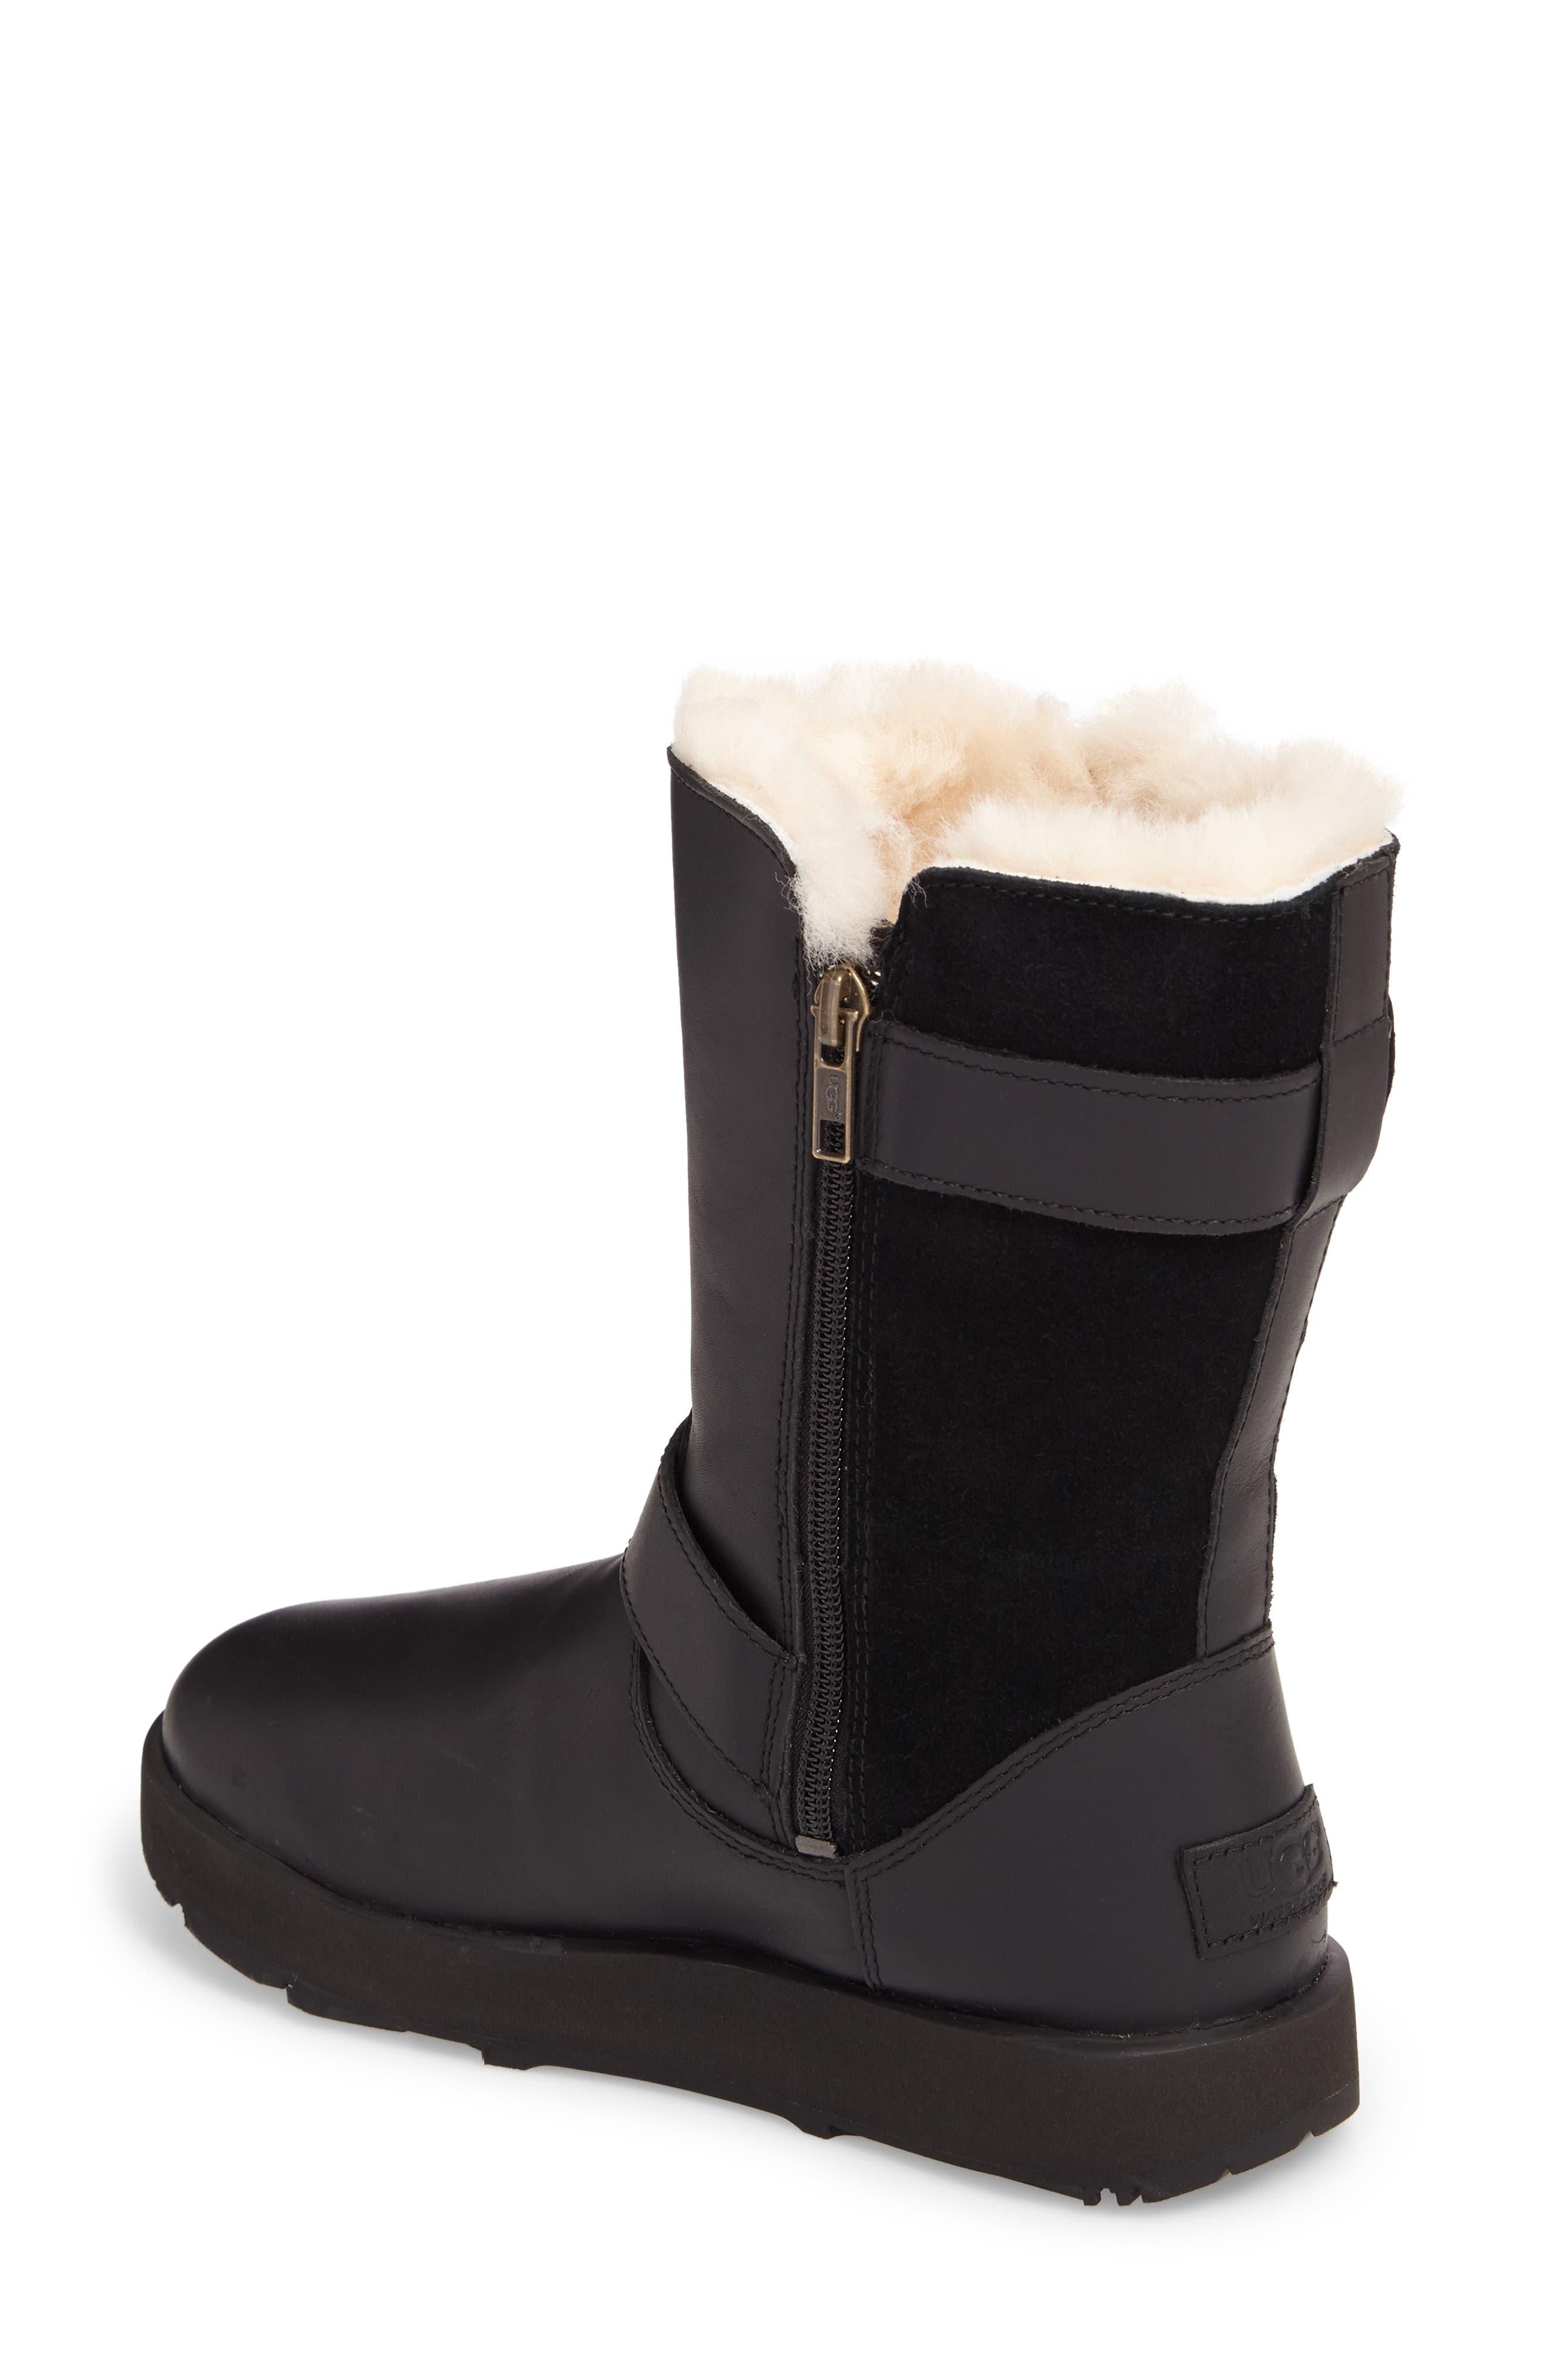 Breida Waterproof Boot,                             Alternate thumbnail 2, color,                             001